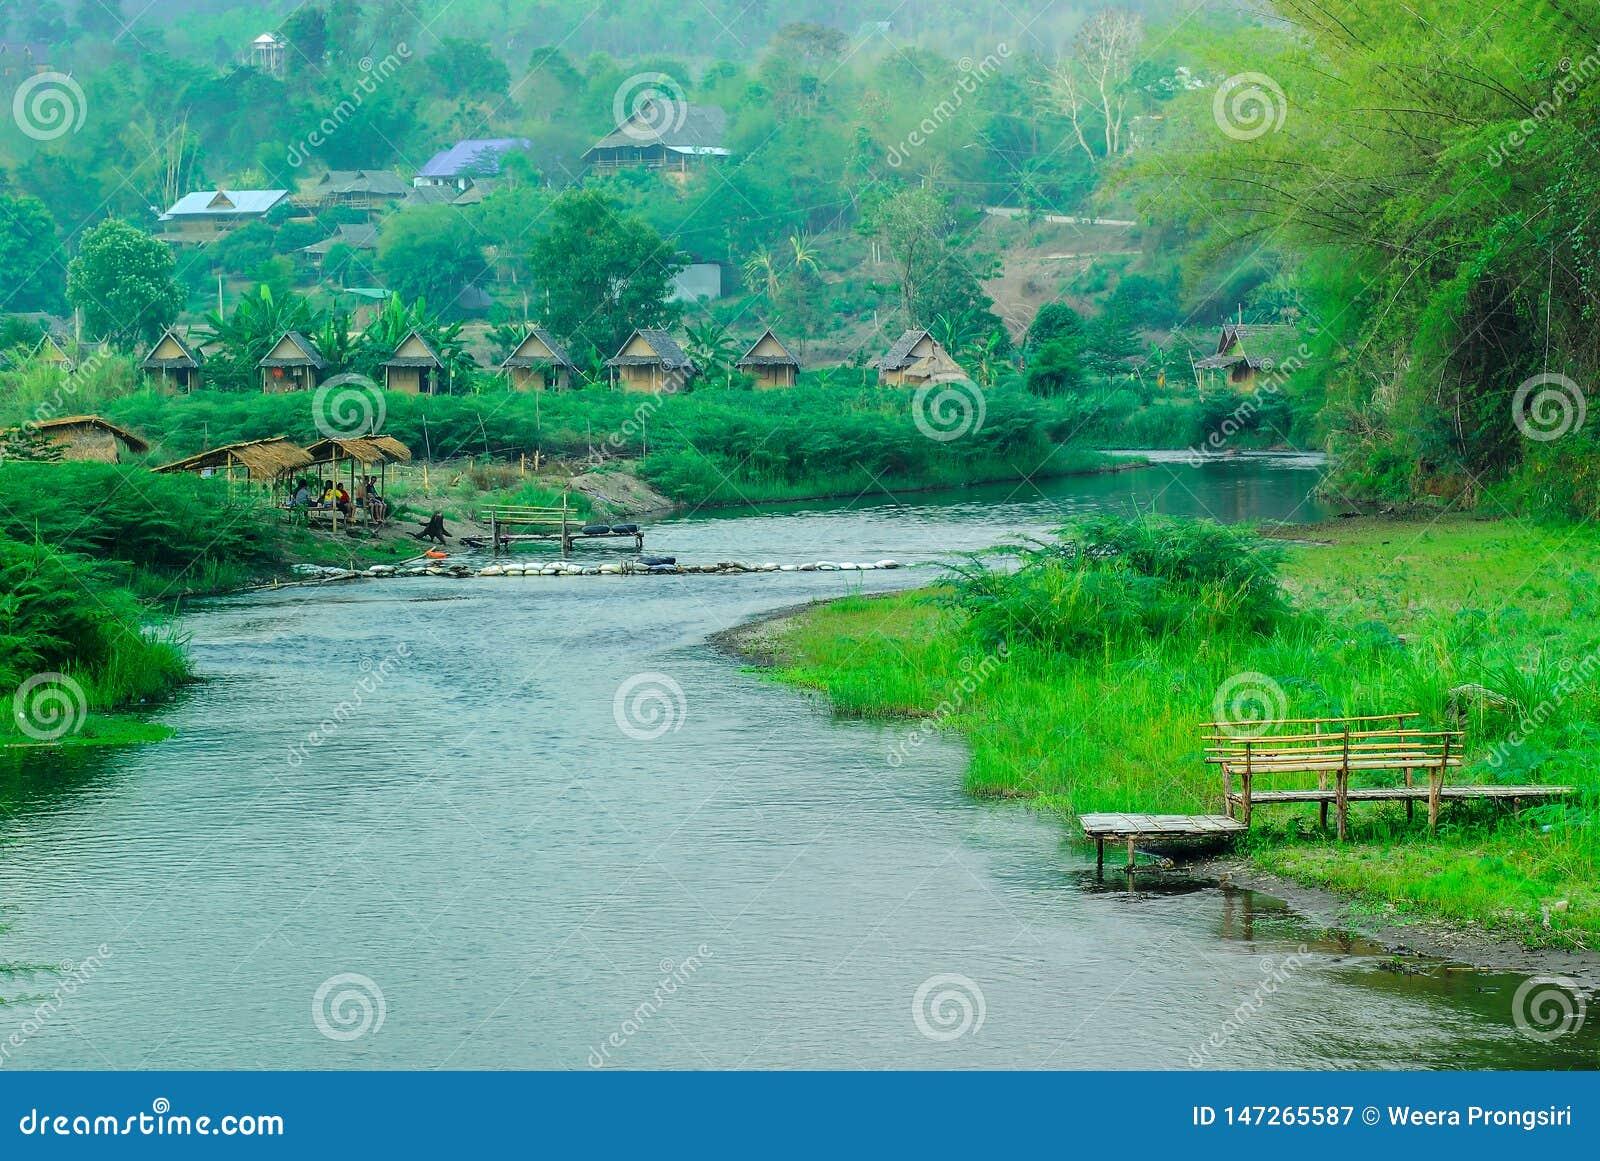 Bamboo - Plant, Lake, Summer, Water, Asia